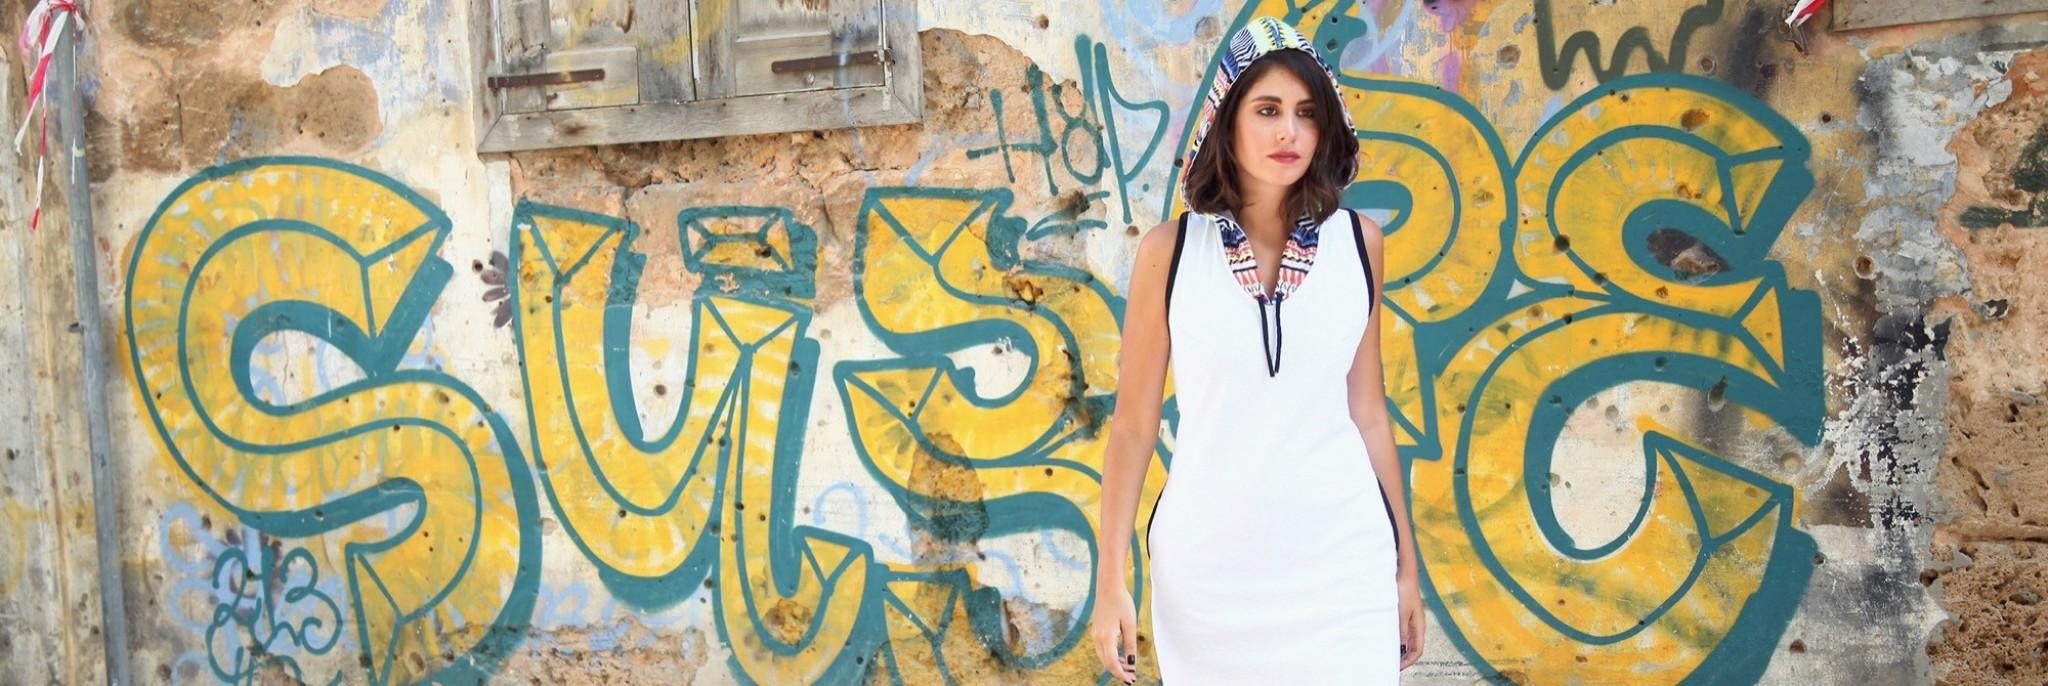 #BestofBeirut: 7 Days of Chic with Fashion Blogger Nour Arida